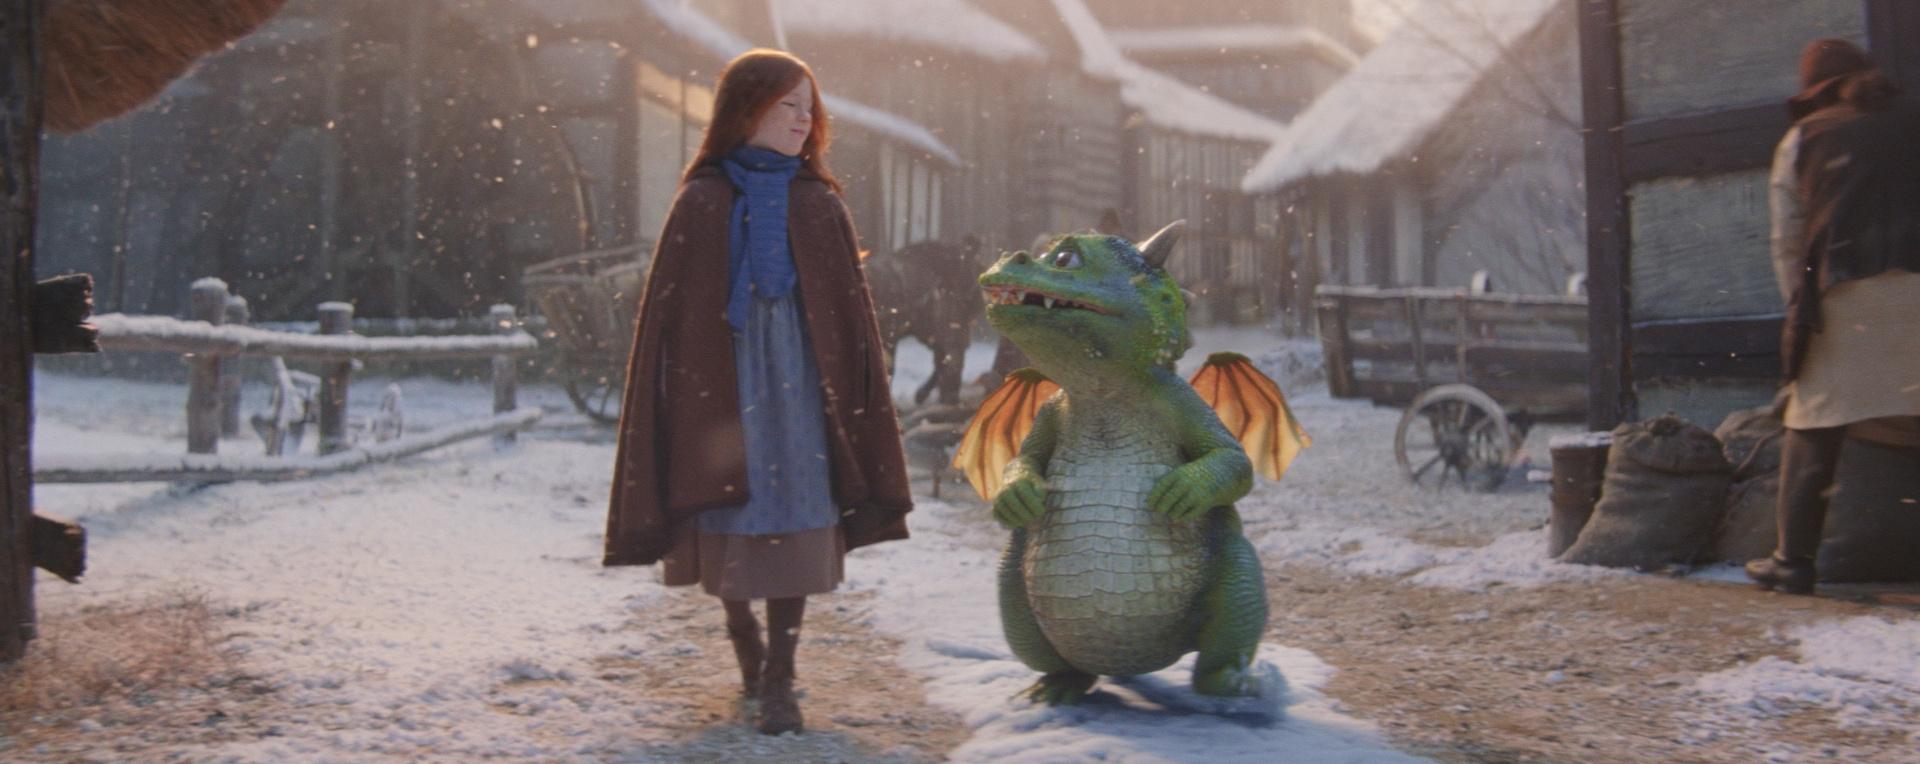 John Lewis Christmas ad features excitable dragon Edgar